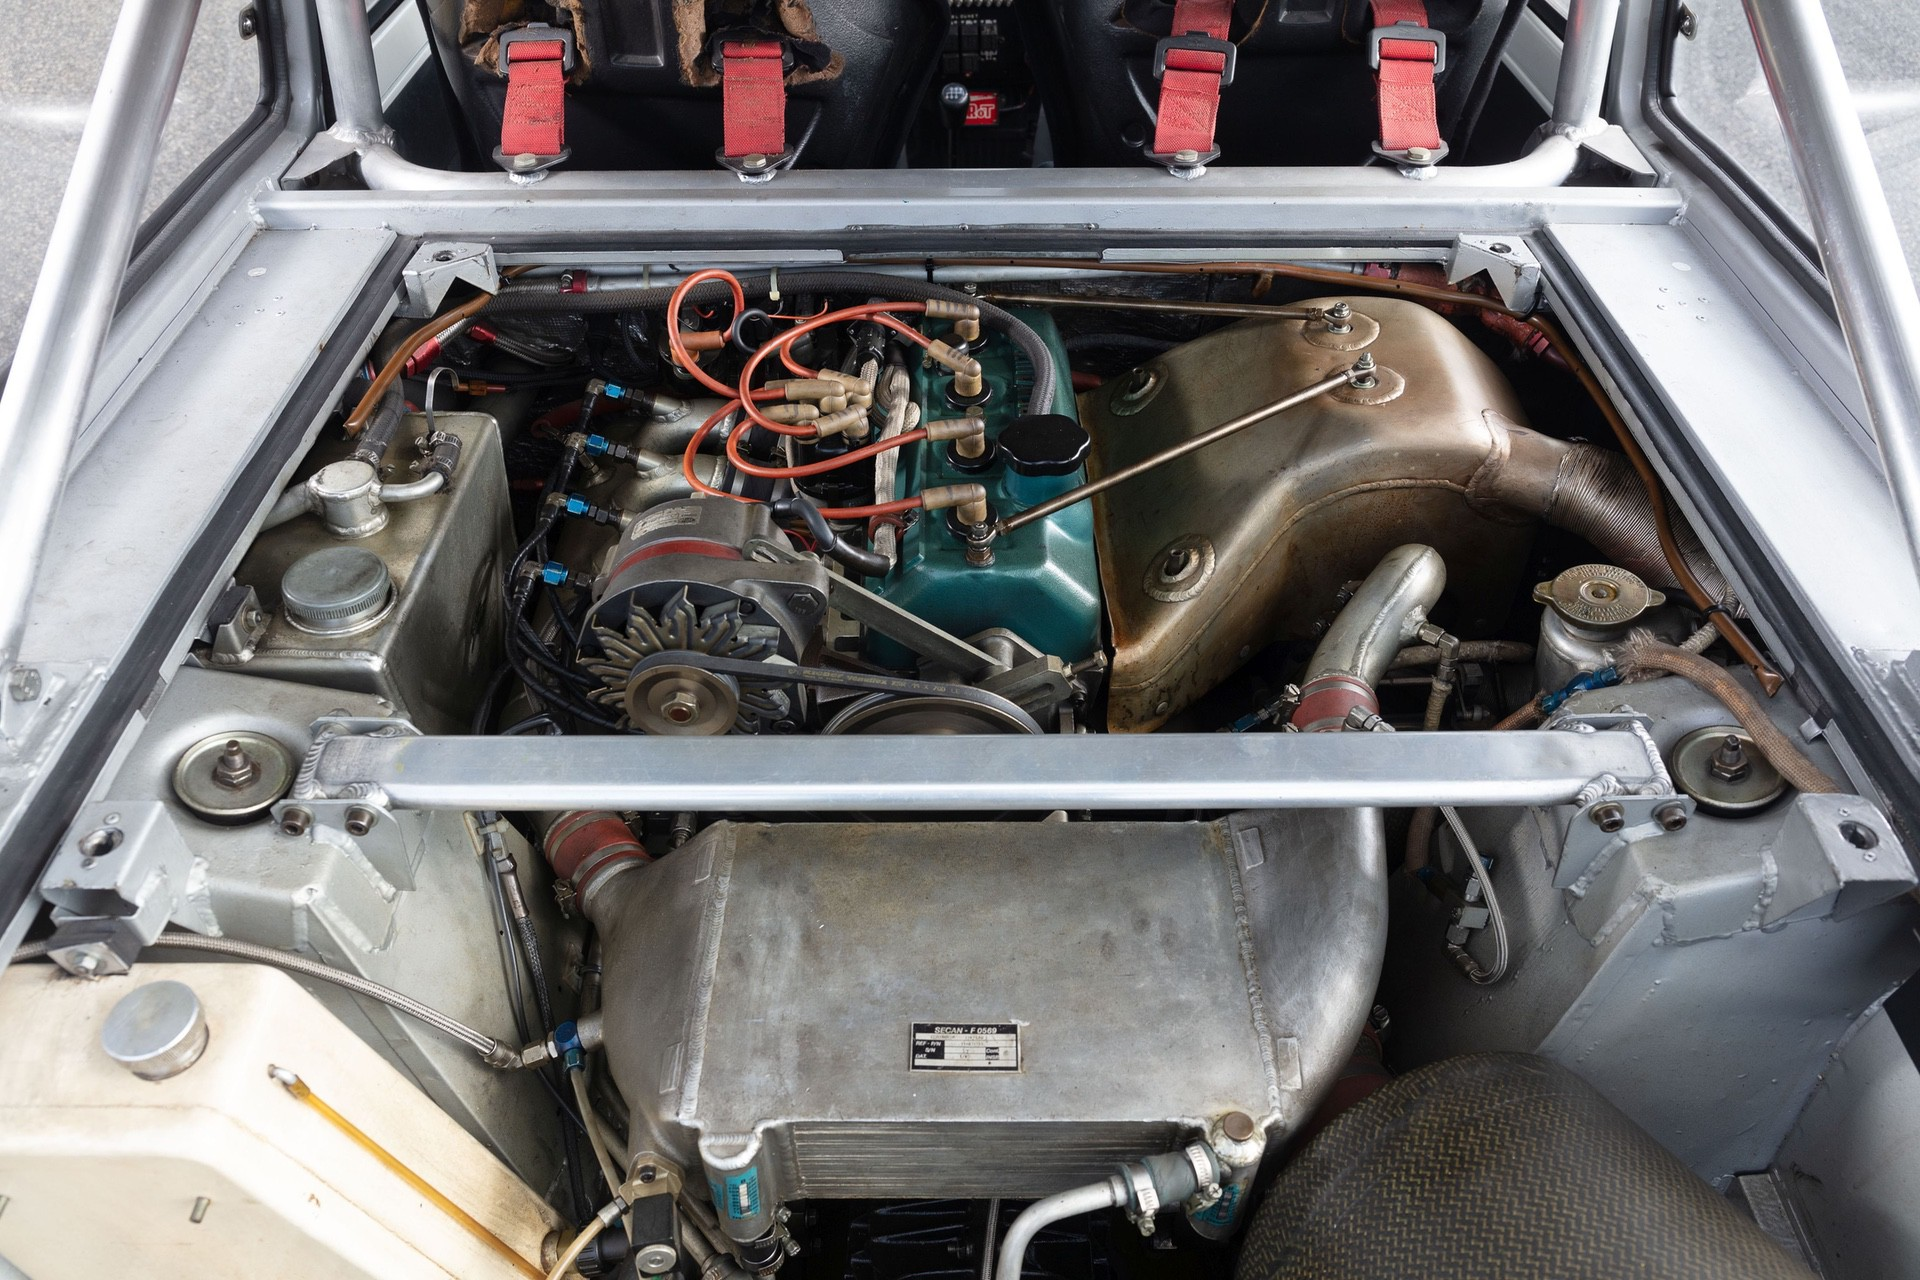 Renault_R5_Maxi_Turbo_ex-Carlos_Sainz-0032